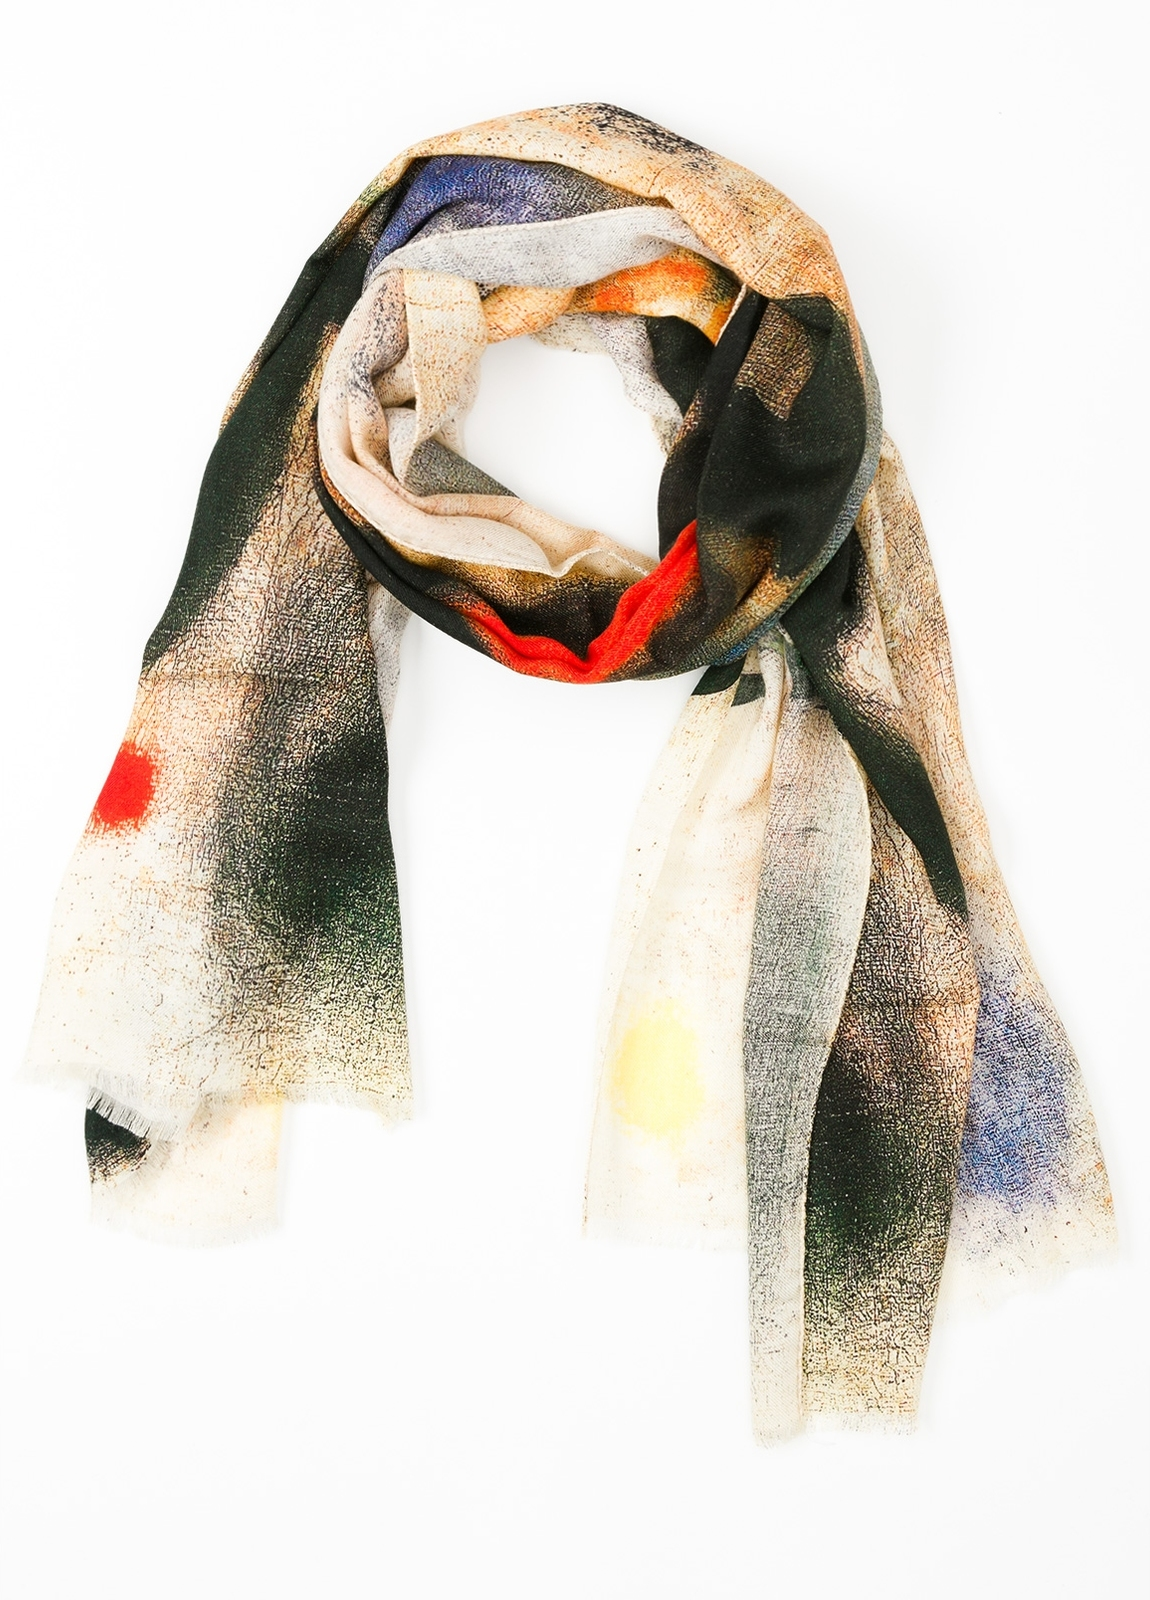 Foulard estampado abstracto color crudo, 70 x 200 cm. 100% Lana.